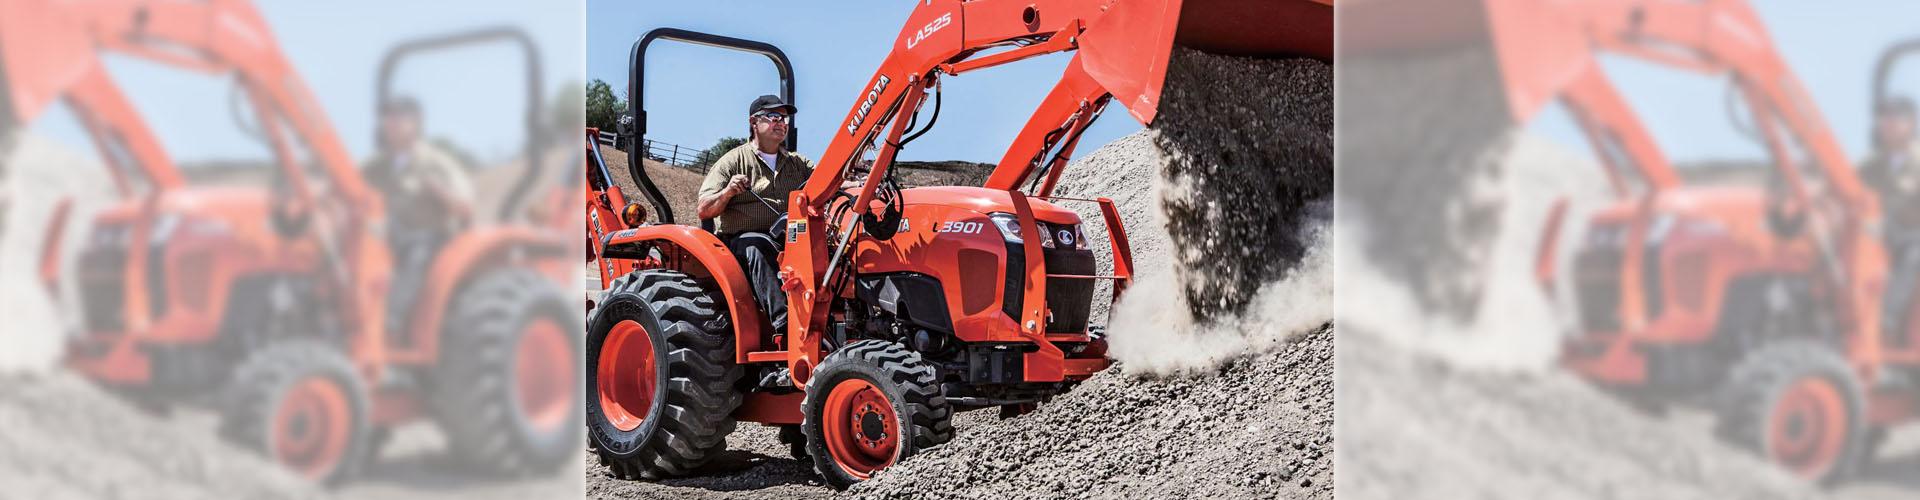 Nebraska Equipment Inc  | Seward, Nebraska | Case IH Kubota